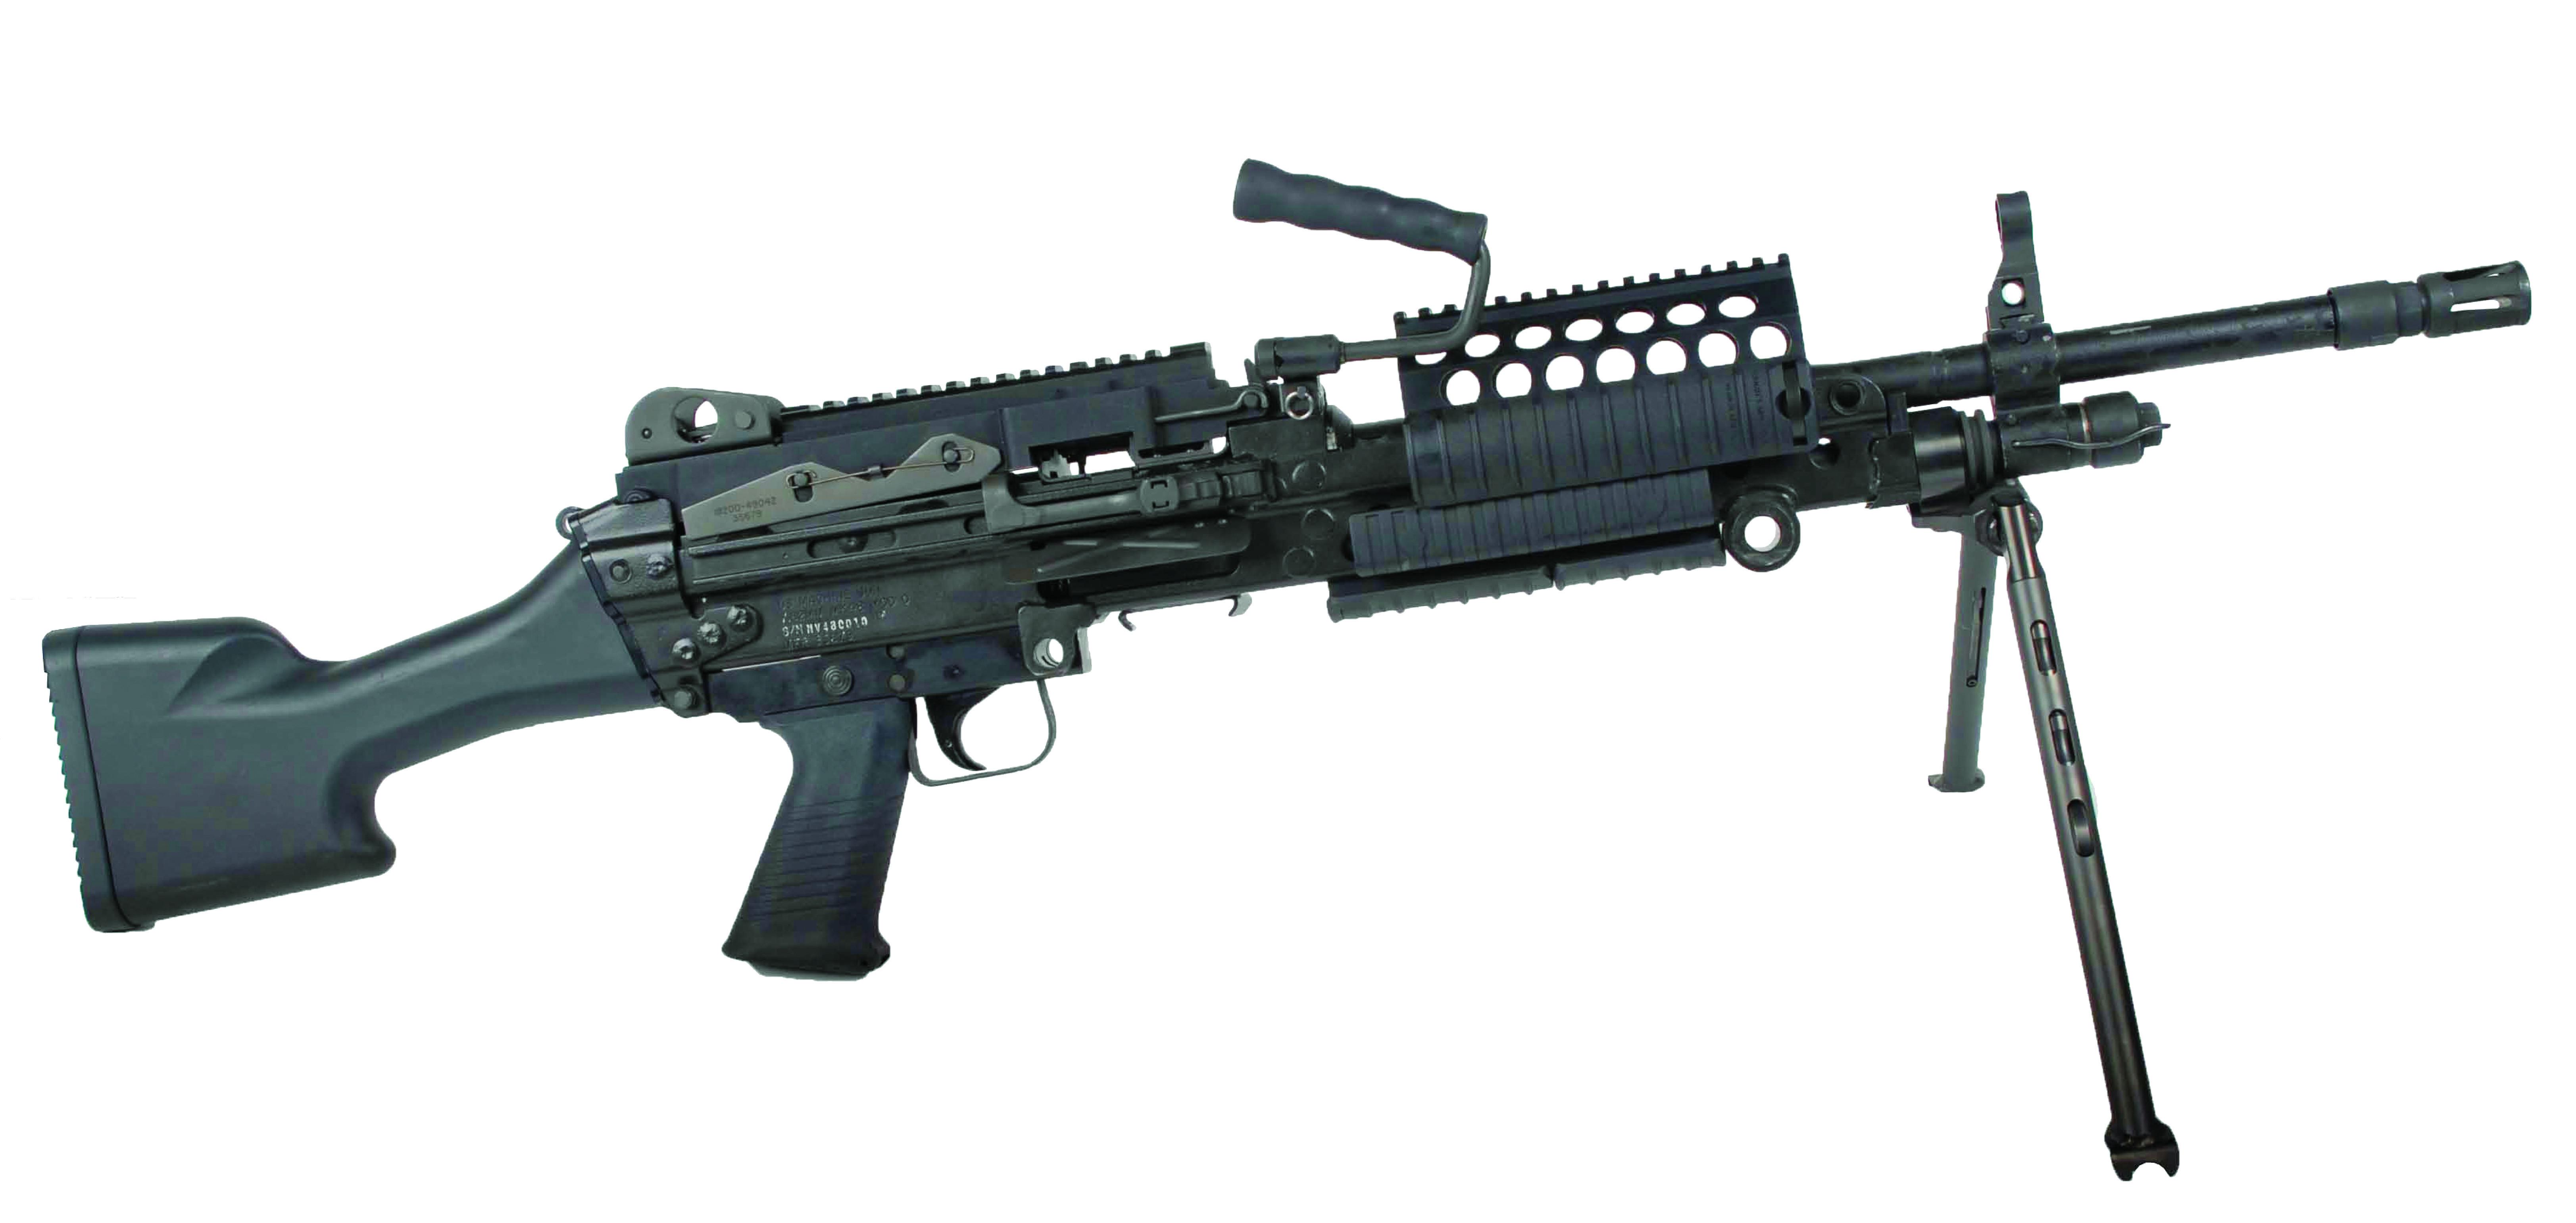 Mk 48 machine gun - Wikipedia